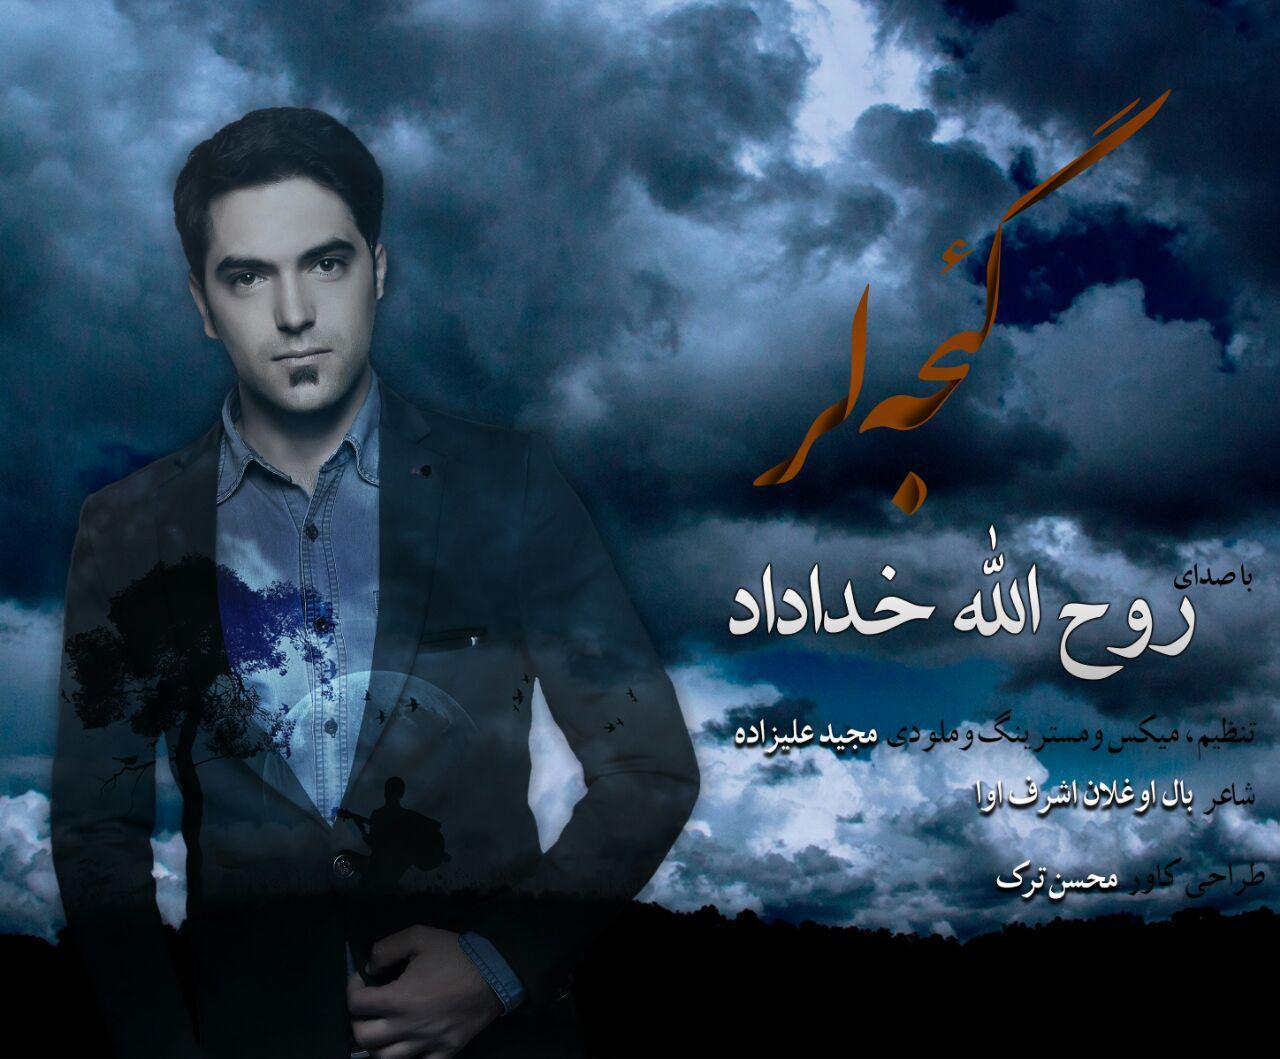 http://s8.picofile.com/file/8292030792/11Ruhollah_Khodadad_Gejalar.jpg